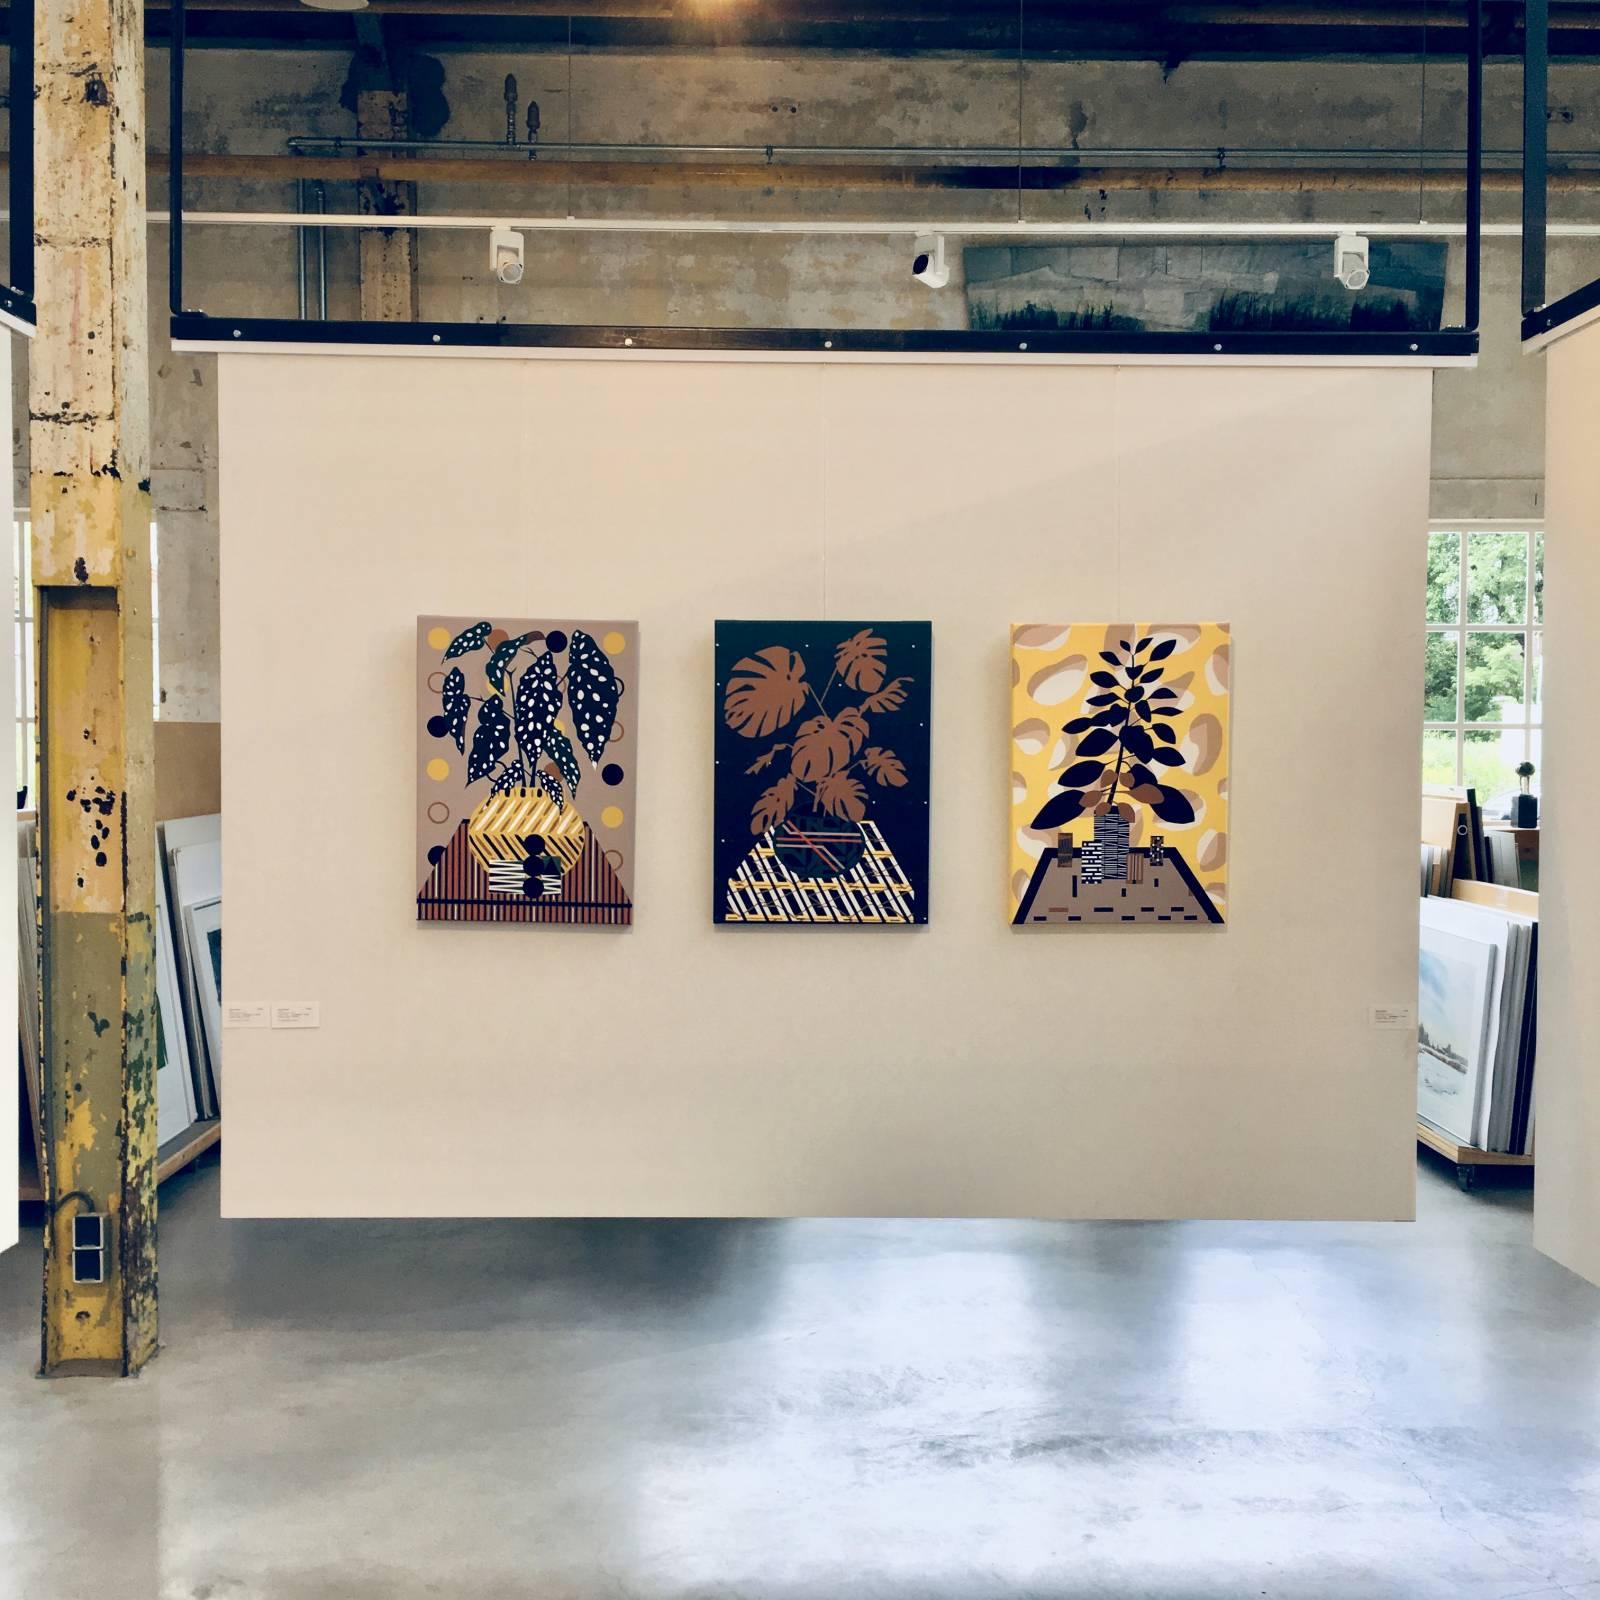 Exhibition at Art Zaanstad: New Acquisitions